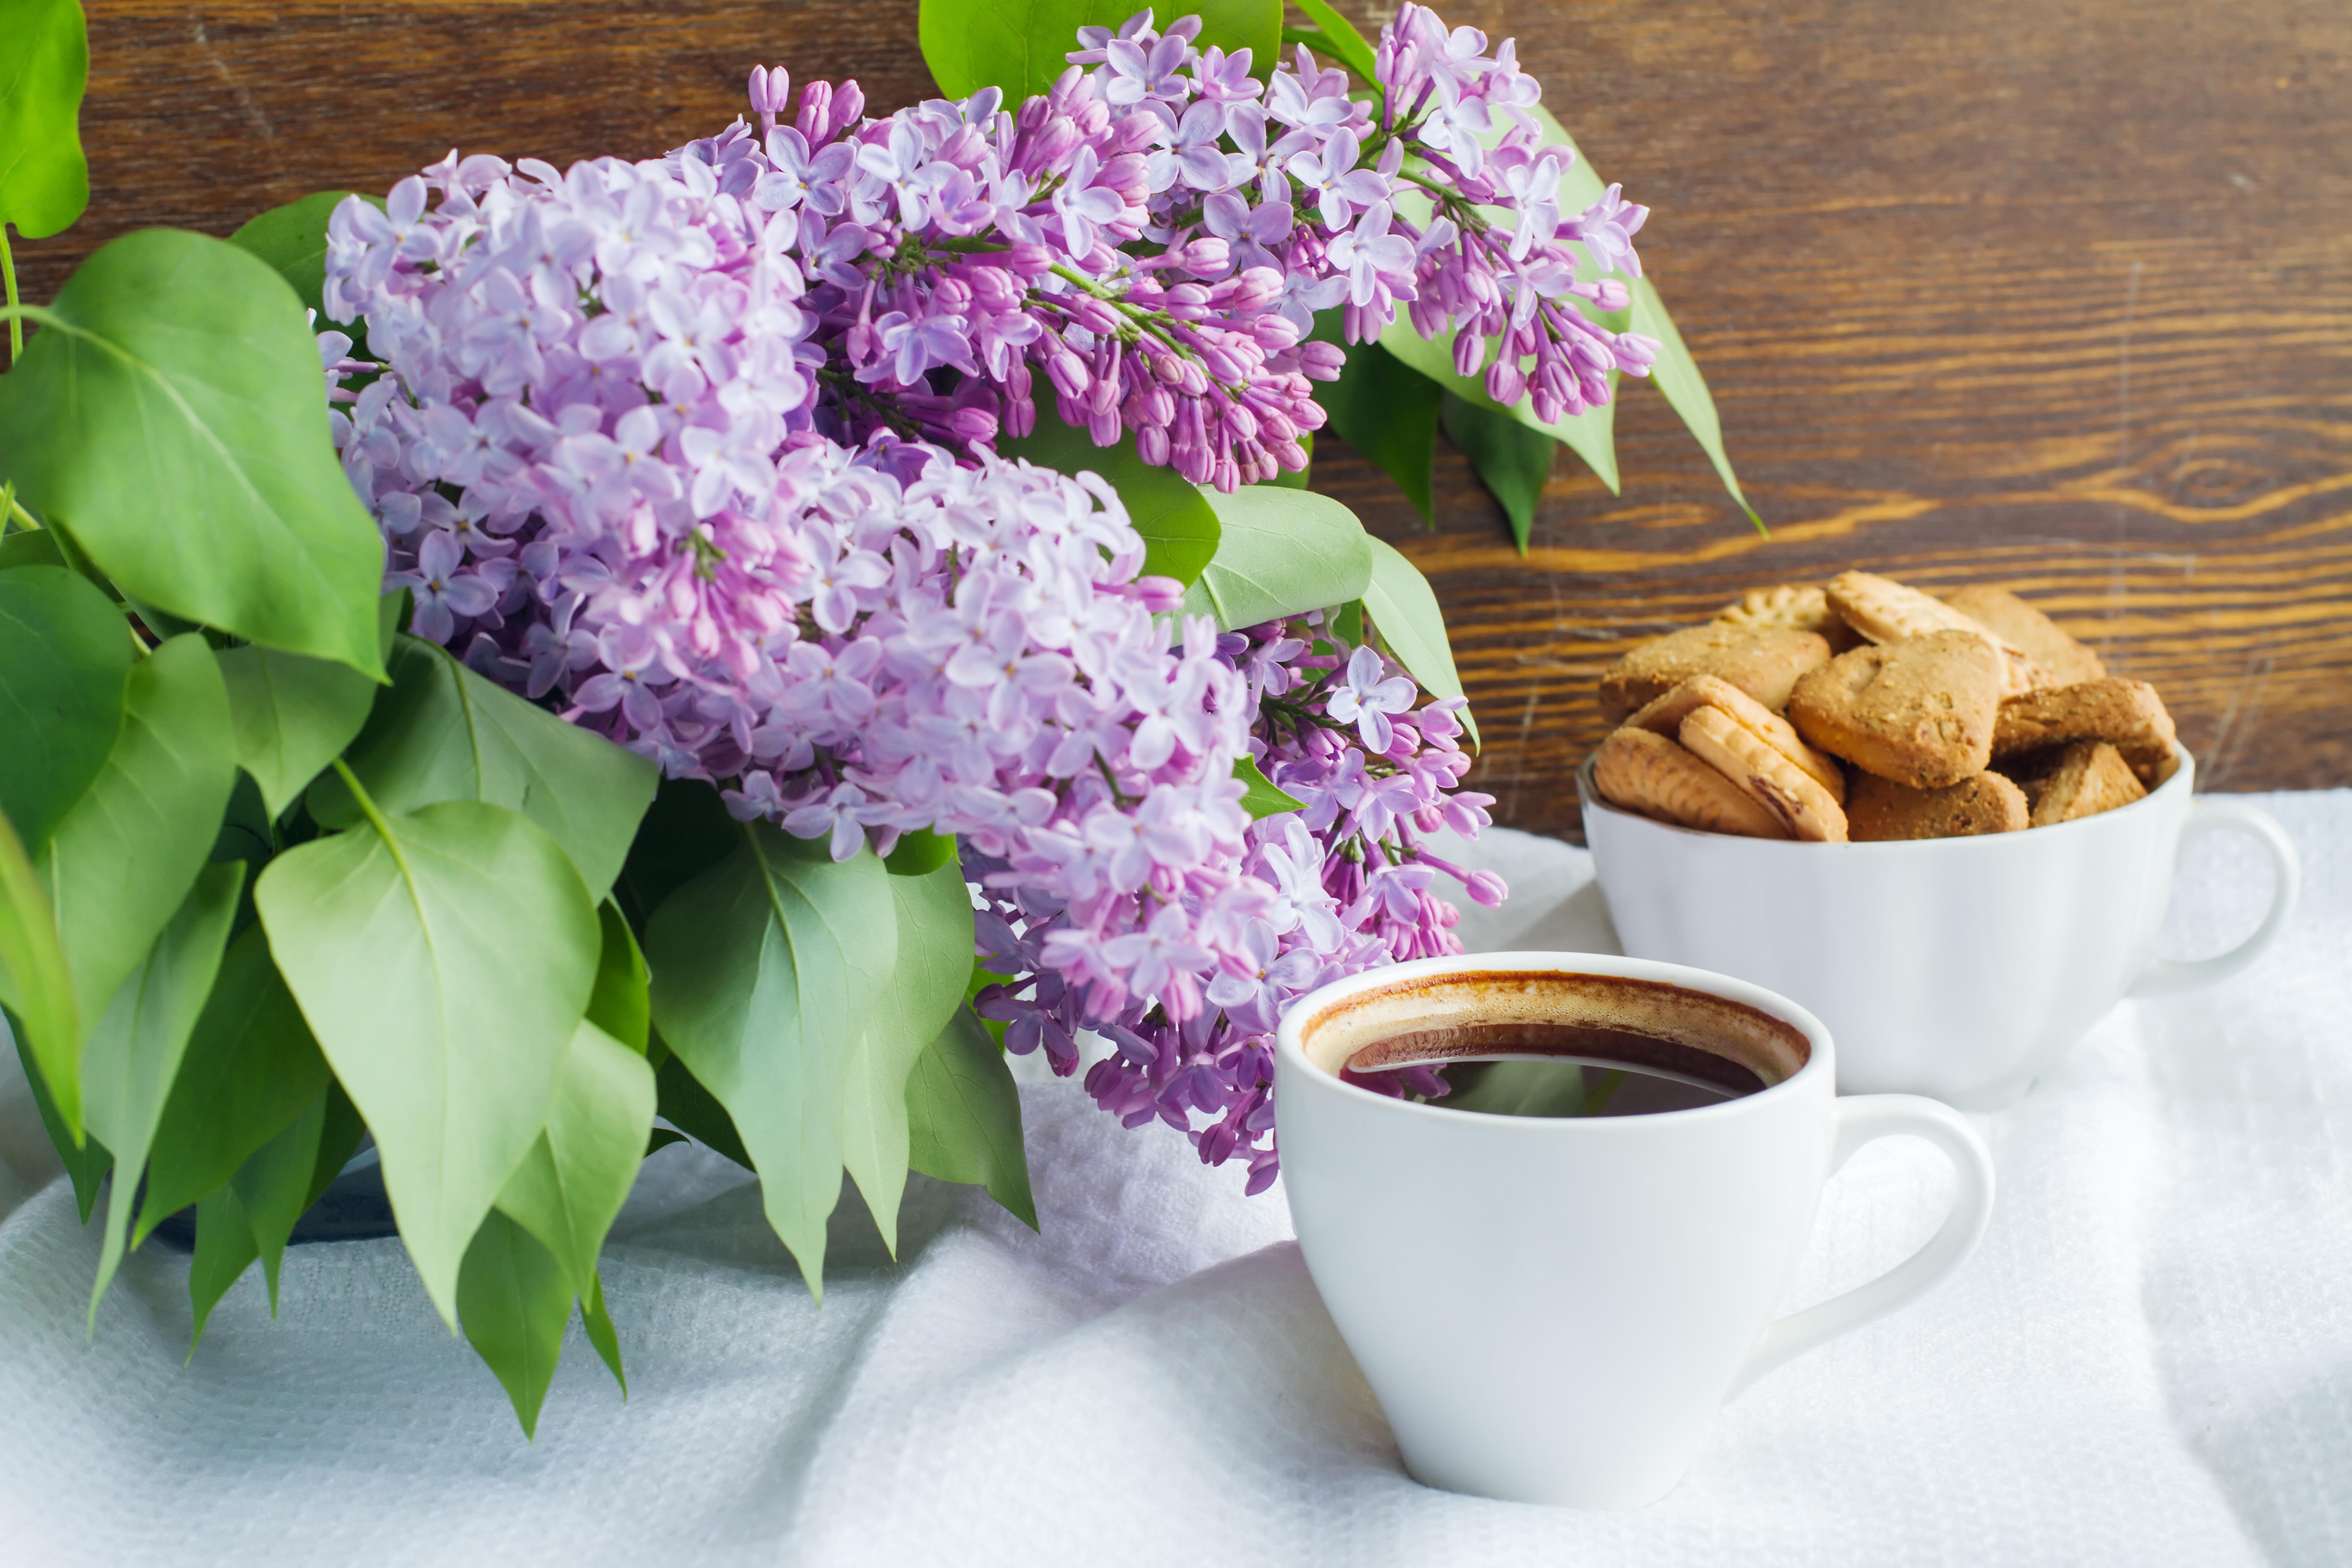 Still-life_Lilac_Coffee_Cookies_Cup_524746_6800x4533.jpg